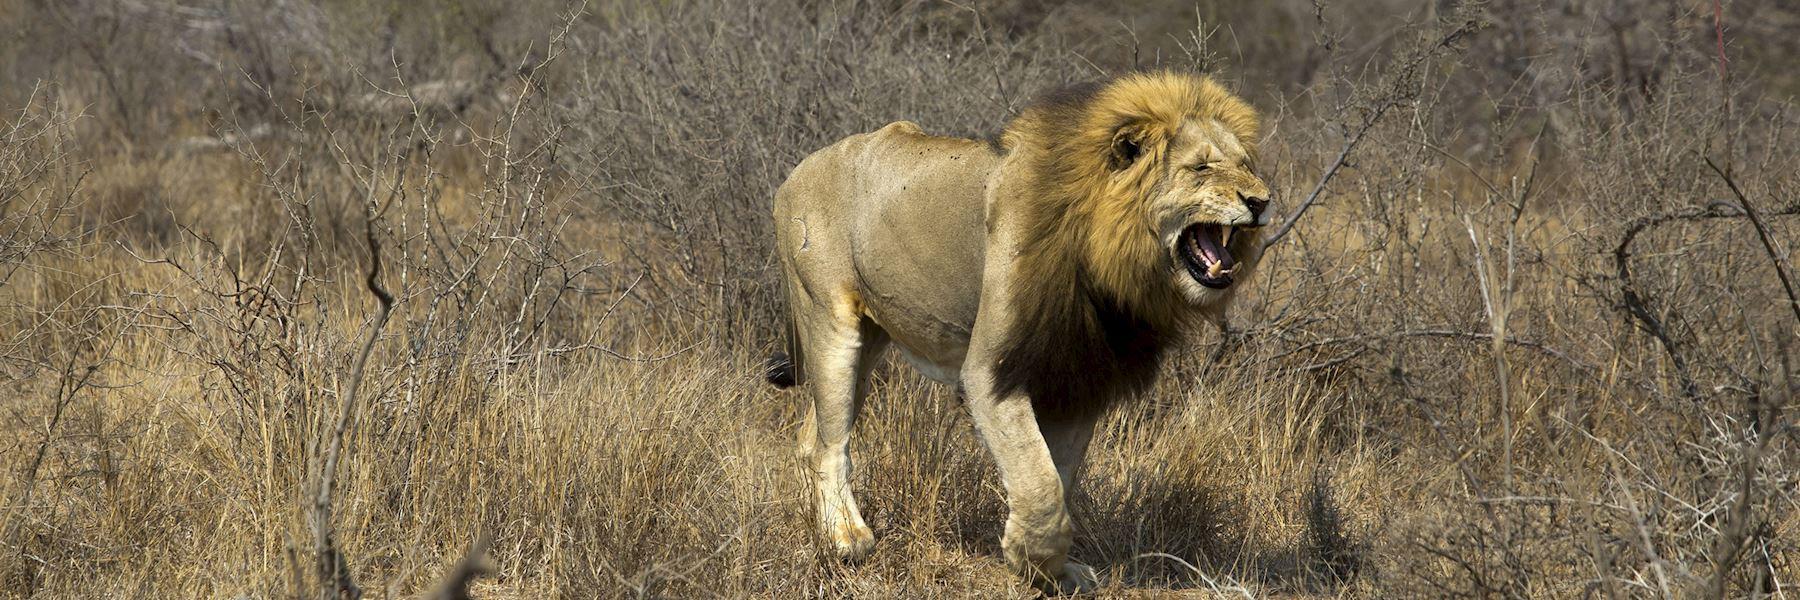 Visit Timbavati Game Reserve, South Africa